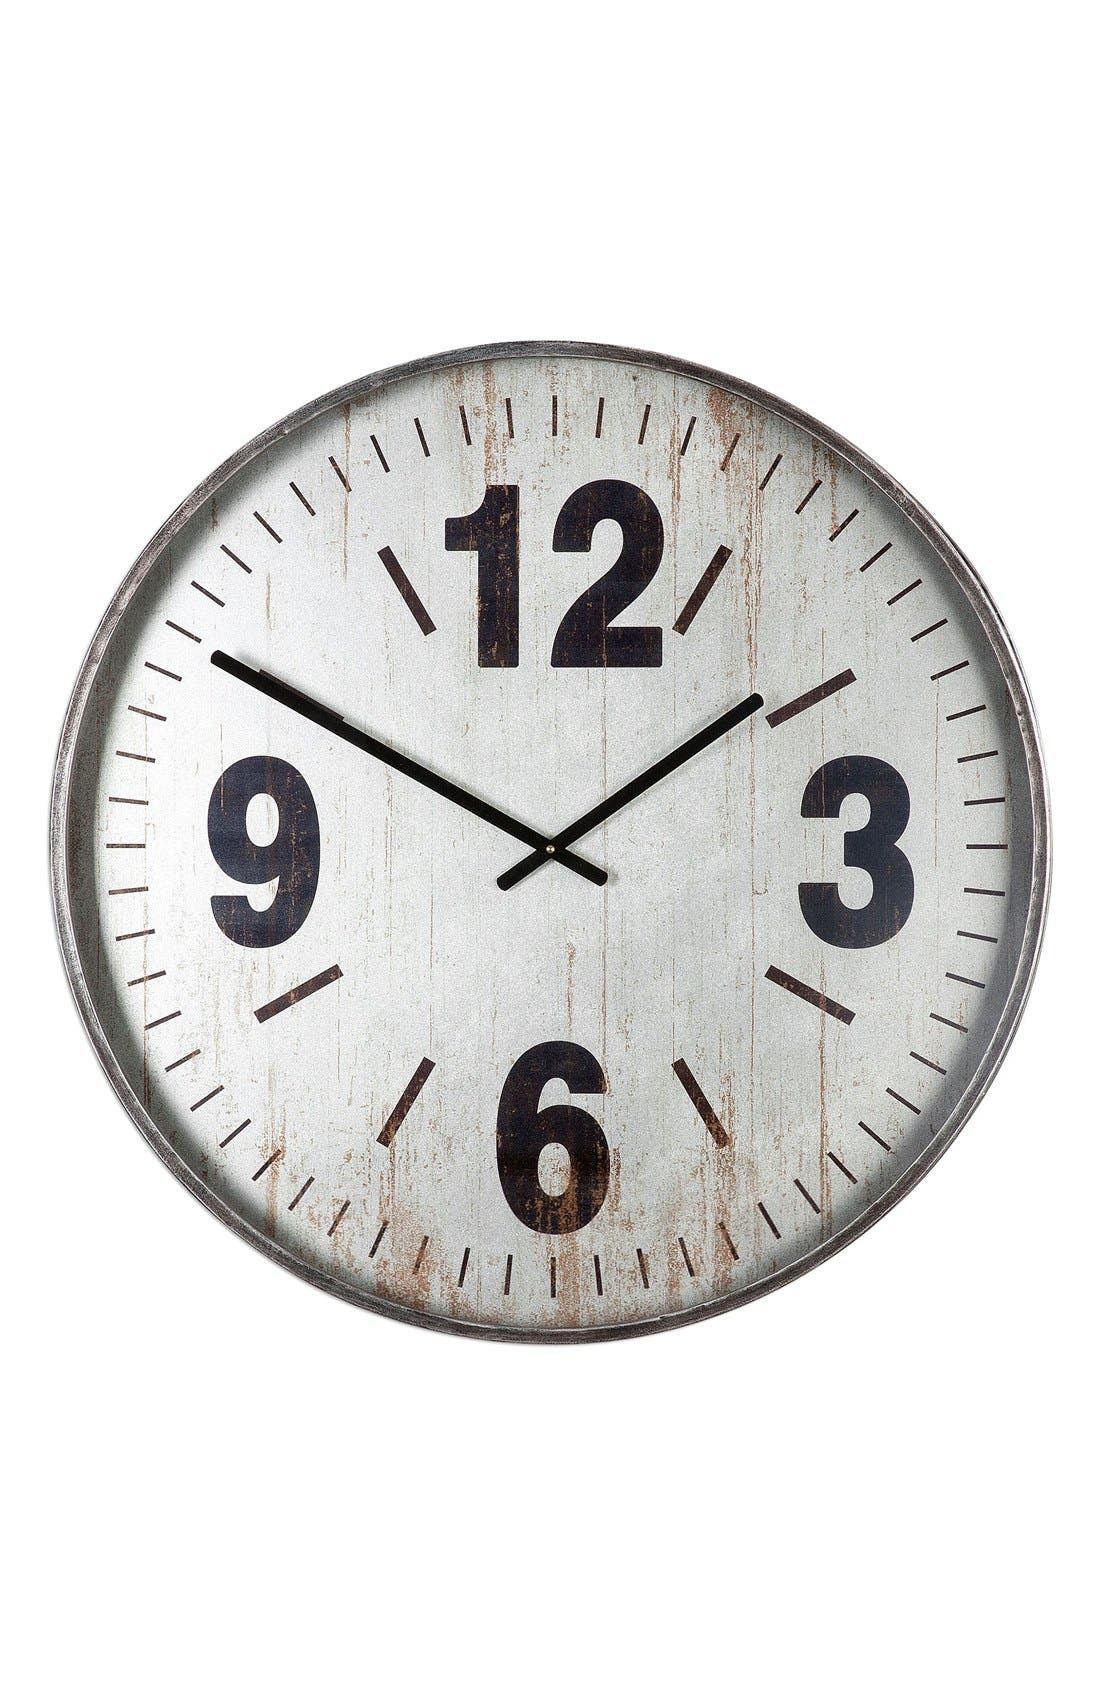 Alternate Image 1 Selected - Uttermost 'Marino' Wall Clock